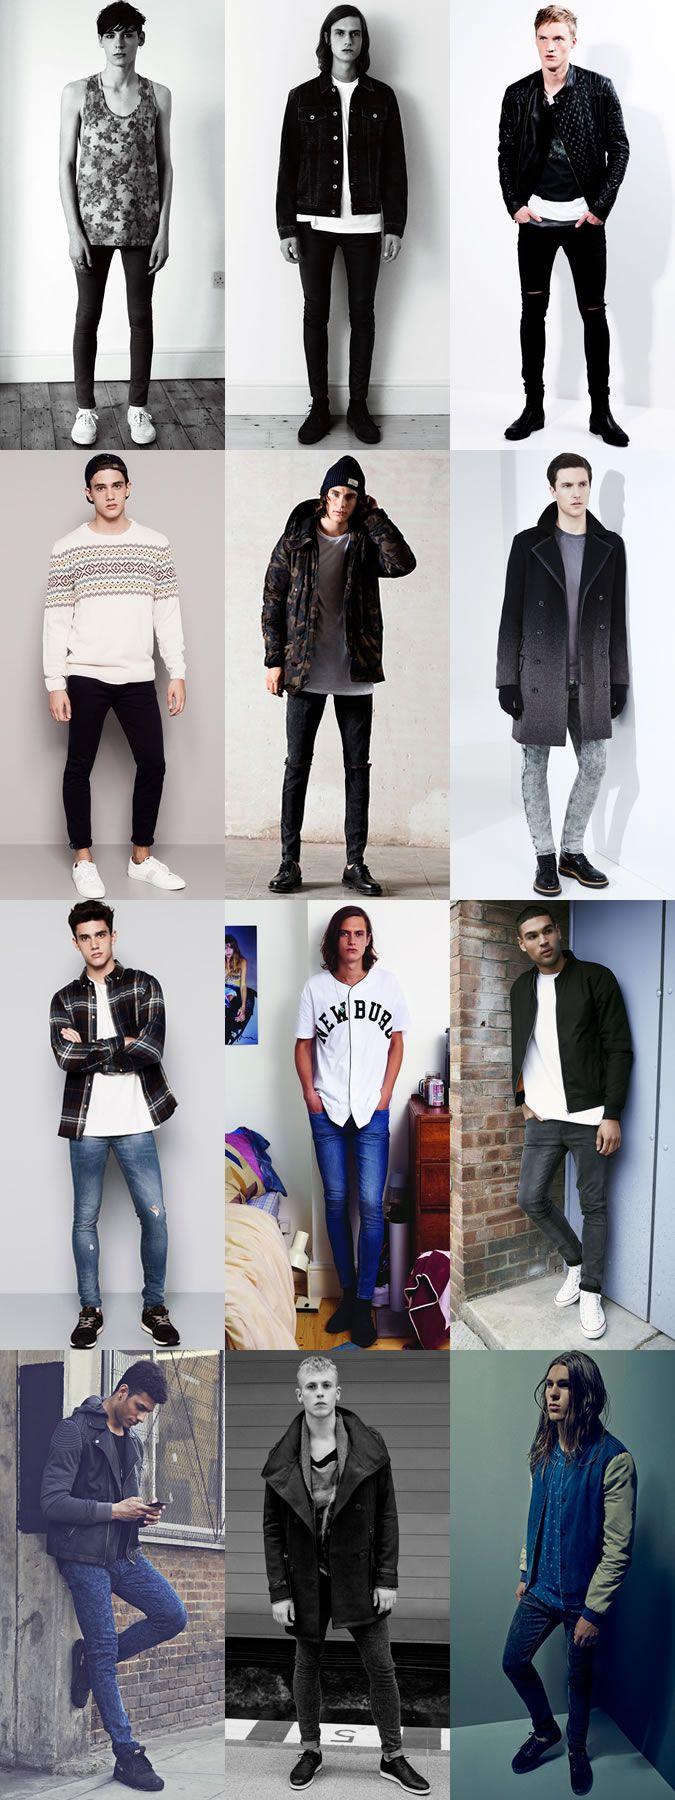 Men's Spray On Skinny Jeans Outfit Inspiration Lookbook